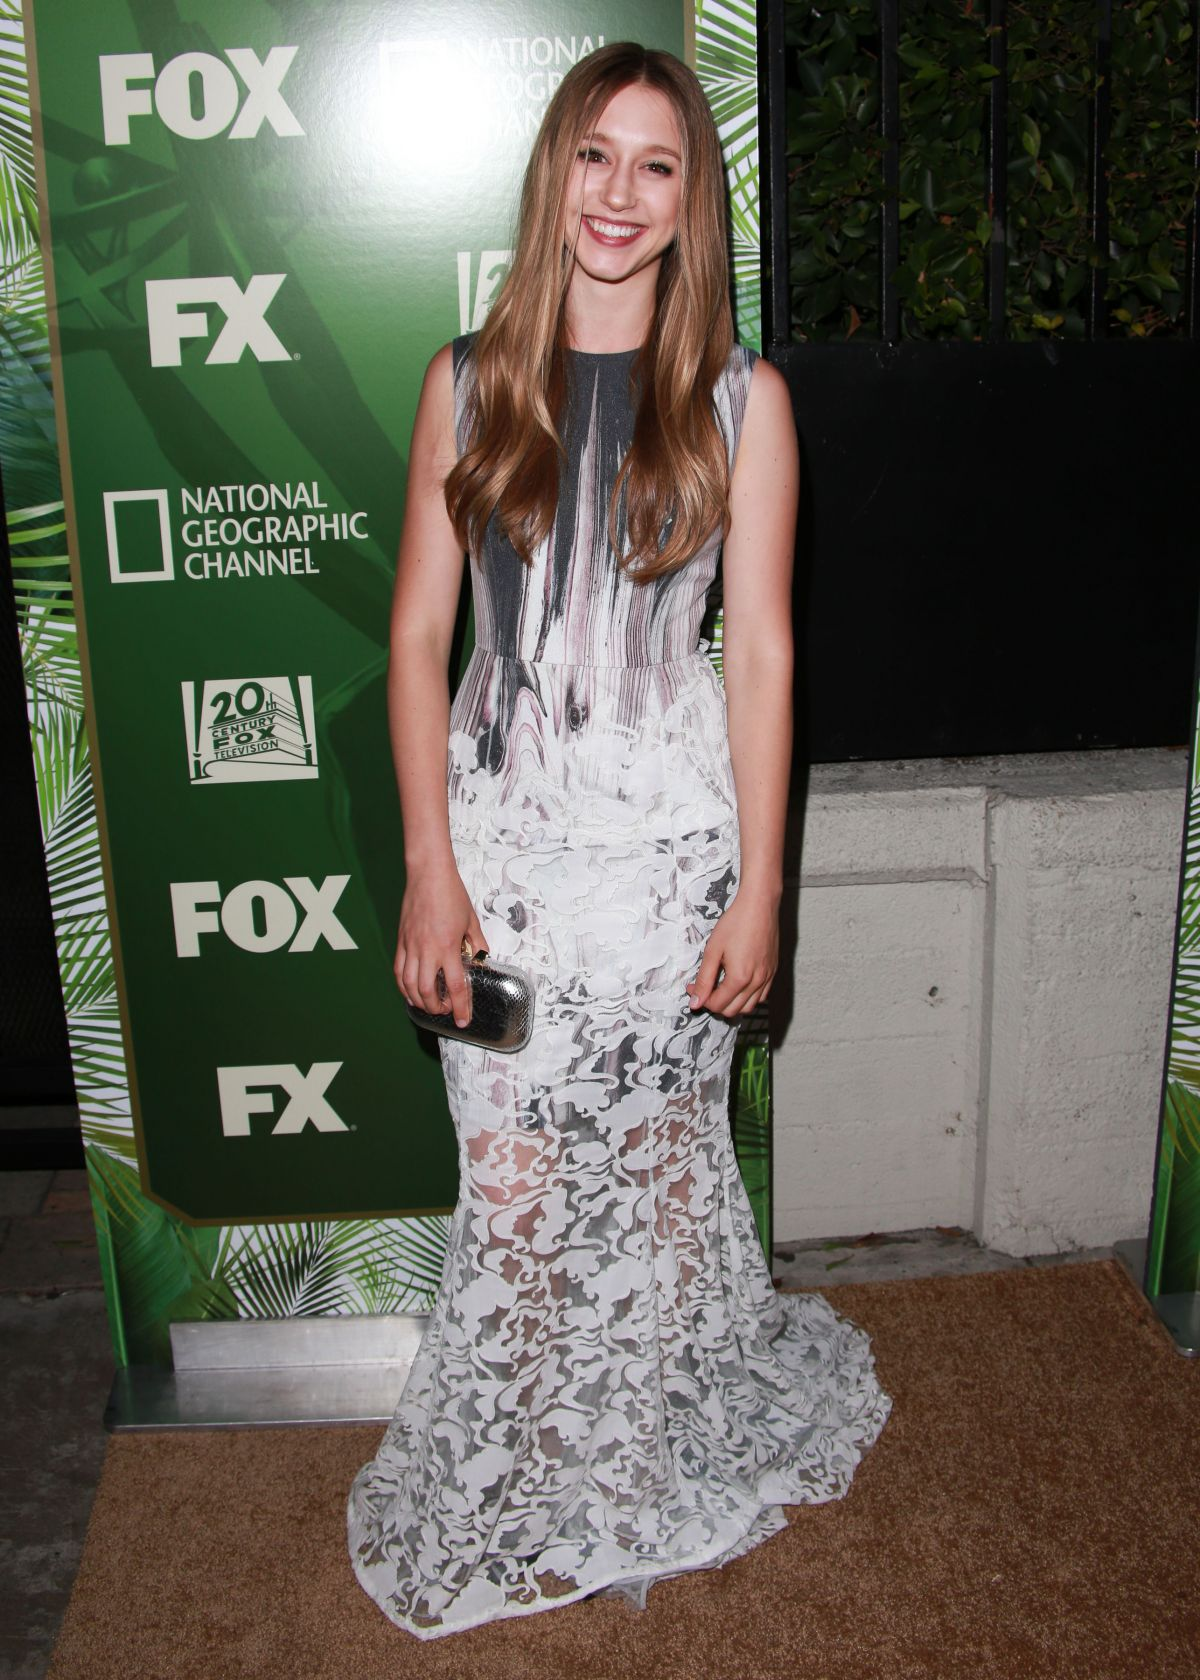 TAISSA FARMIGA at Fox FX National Geographic Emmy Party